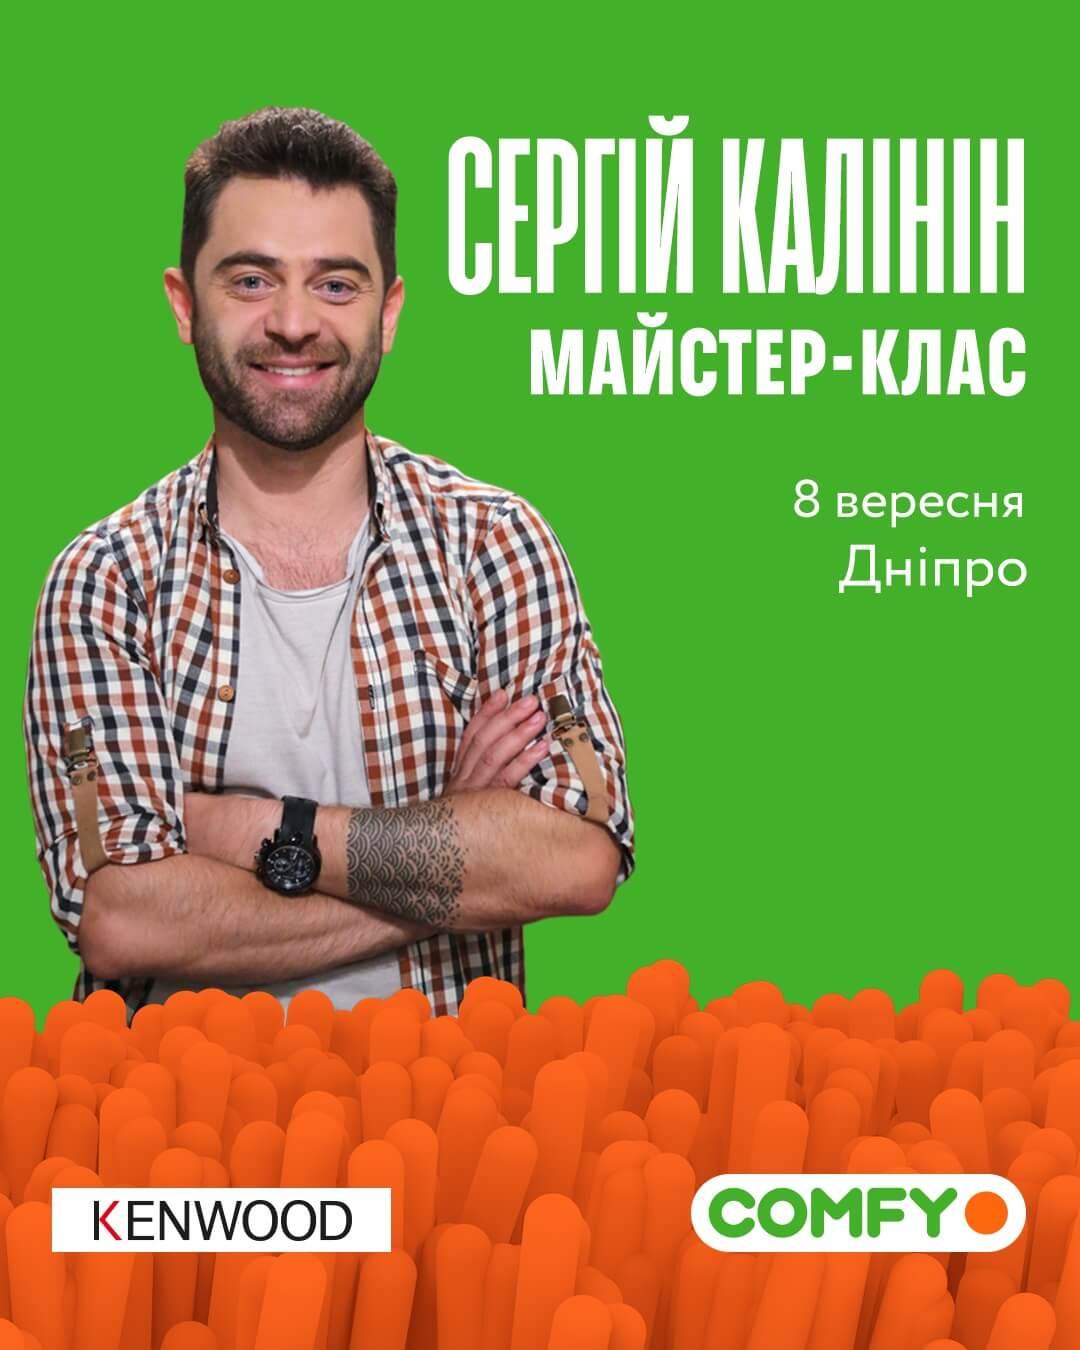 Мастер-класс Сергея Калинина